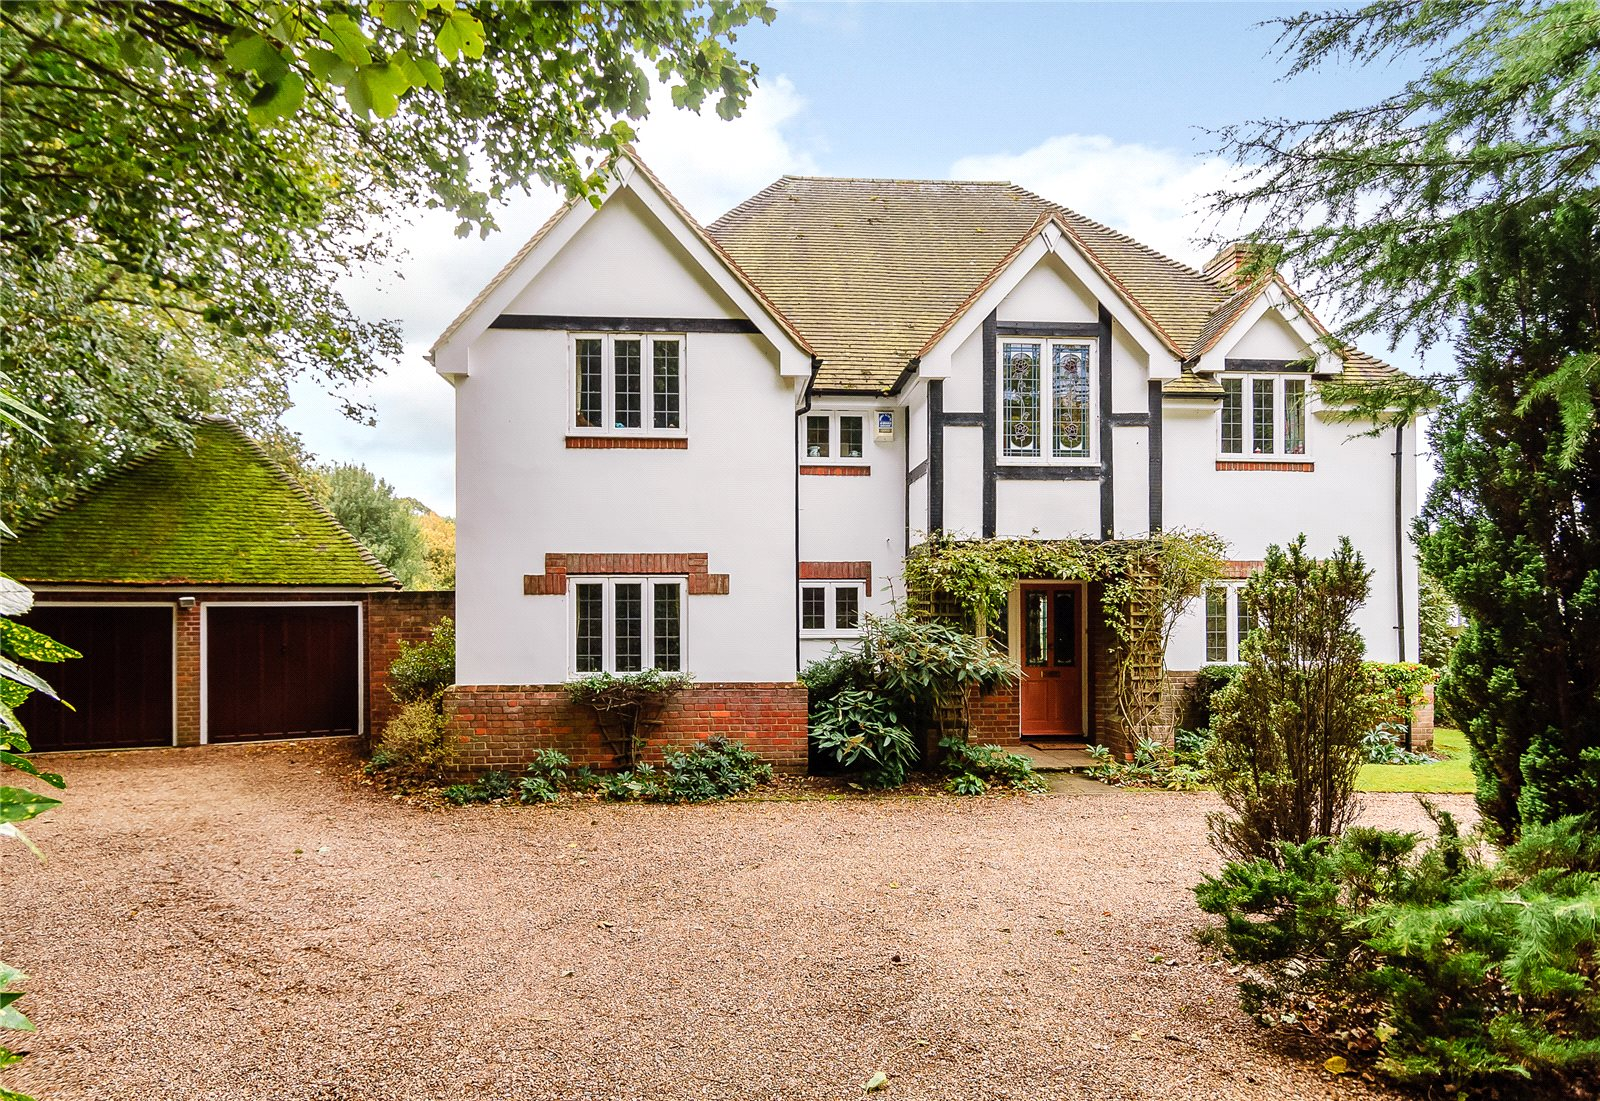 獨棟家庭住宅 為 出售 在 Bibbs Hall Lane, Ayot St. Lawrence, Welwyn, Hertfordshire, AL6 Welwyn, 英格蘭